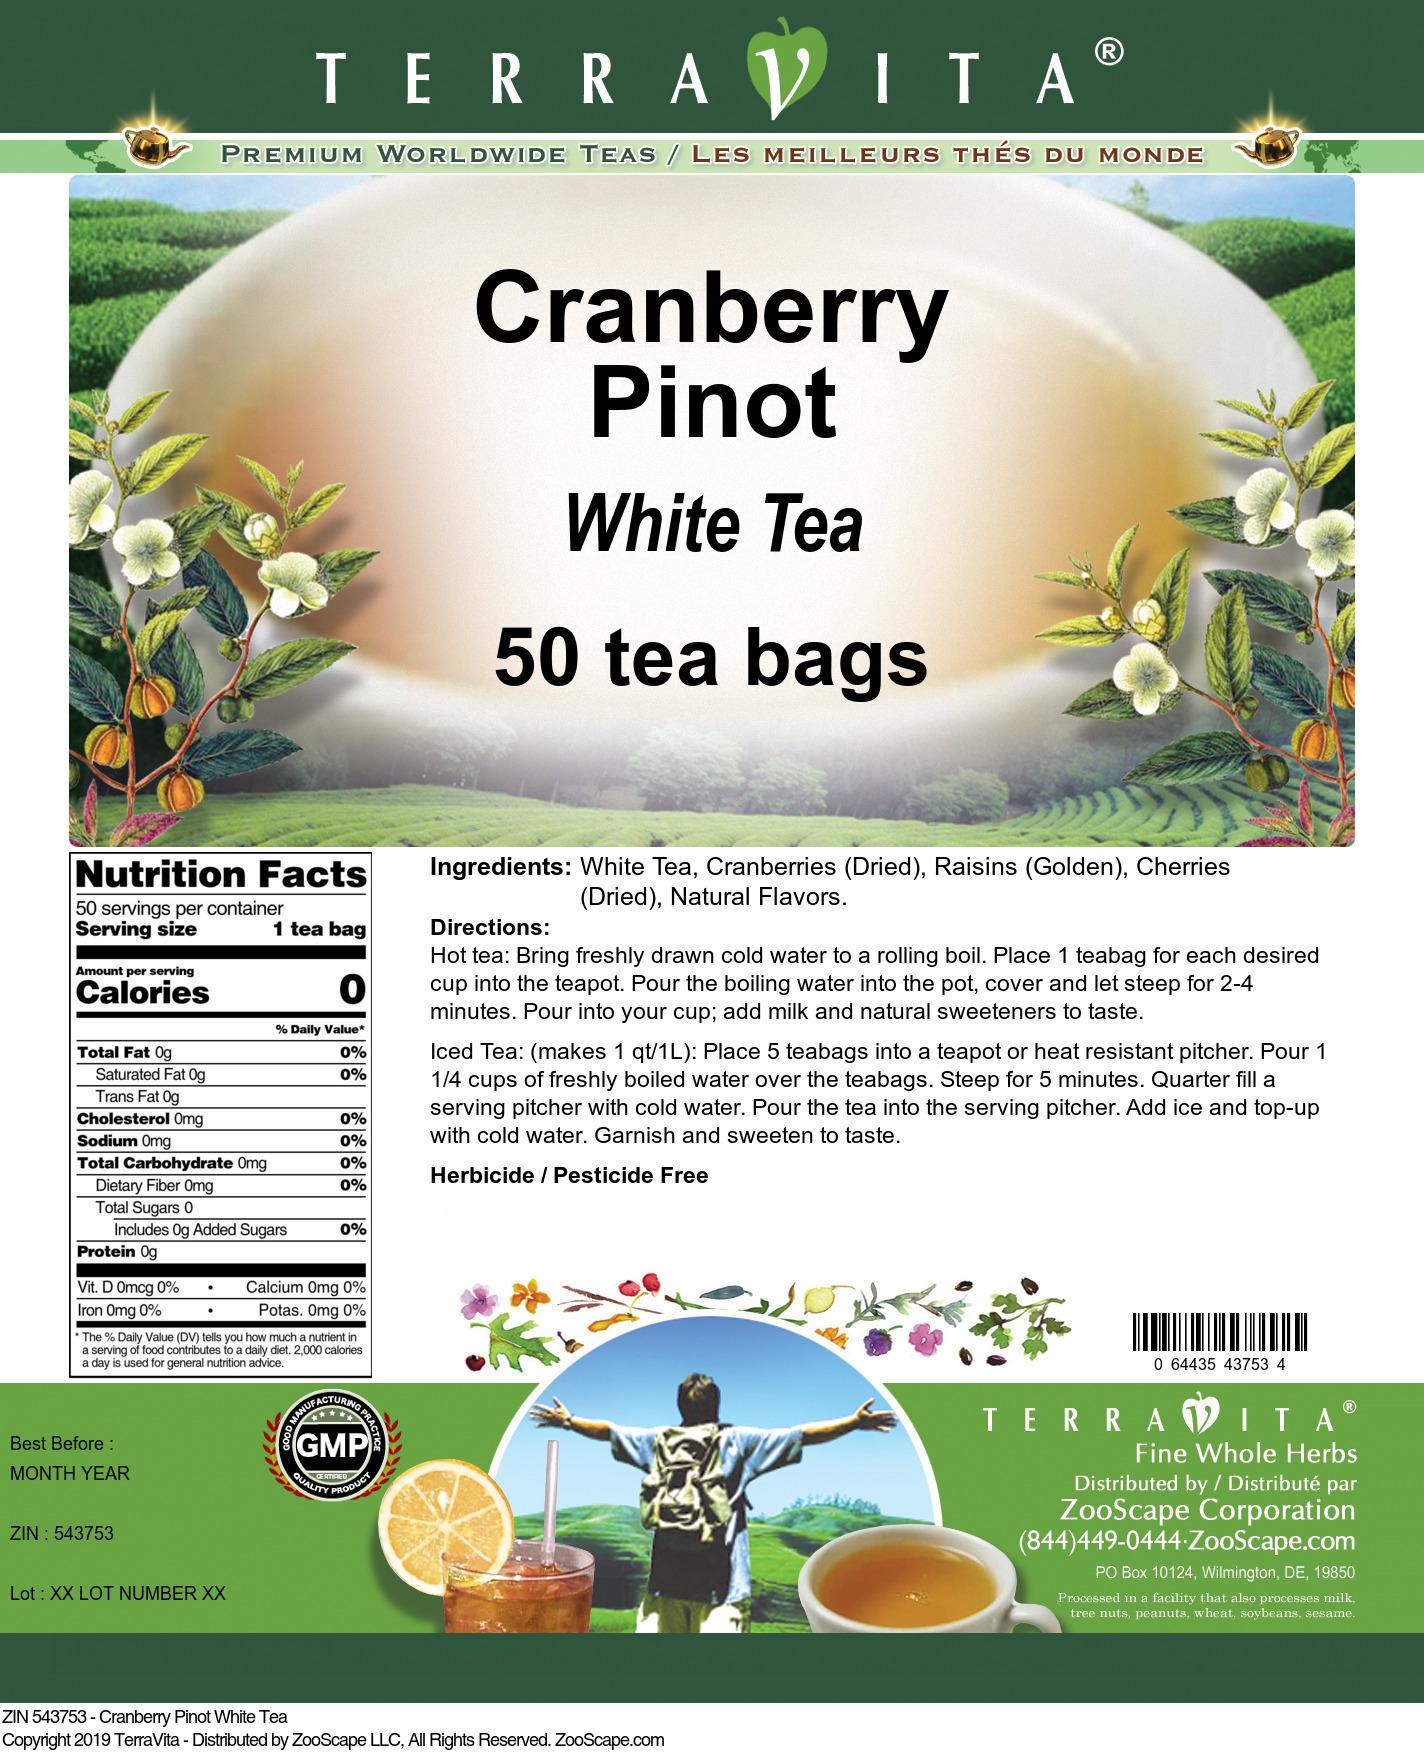 Cranberry Pinot White Tea